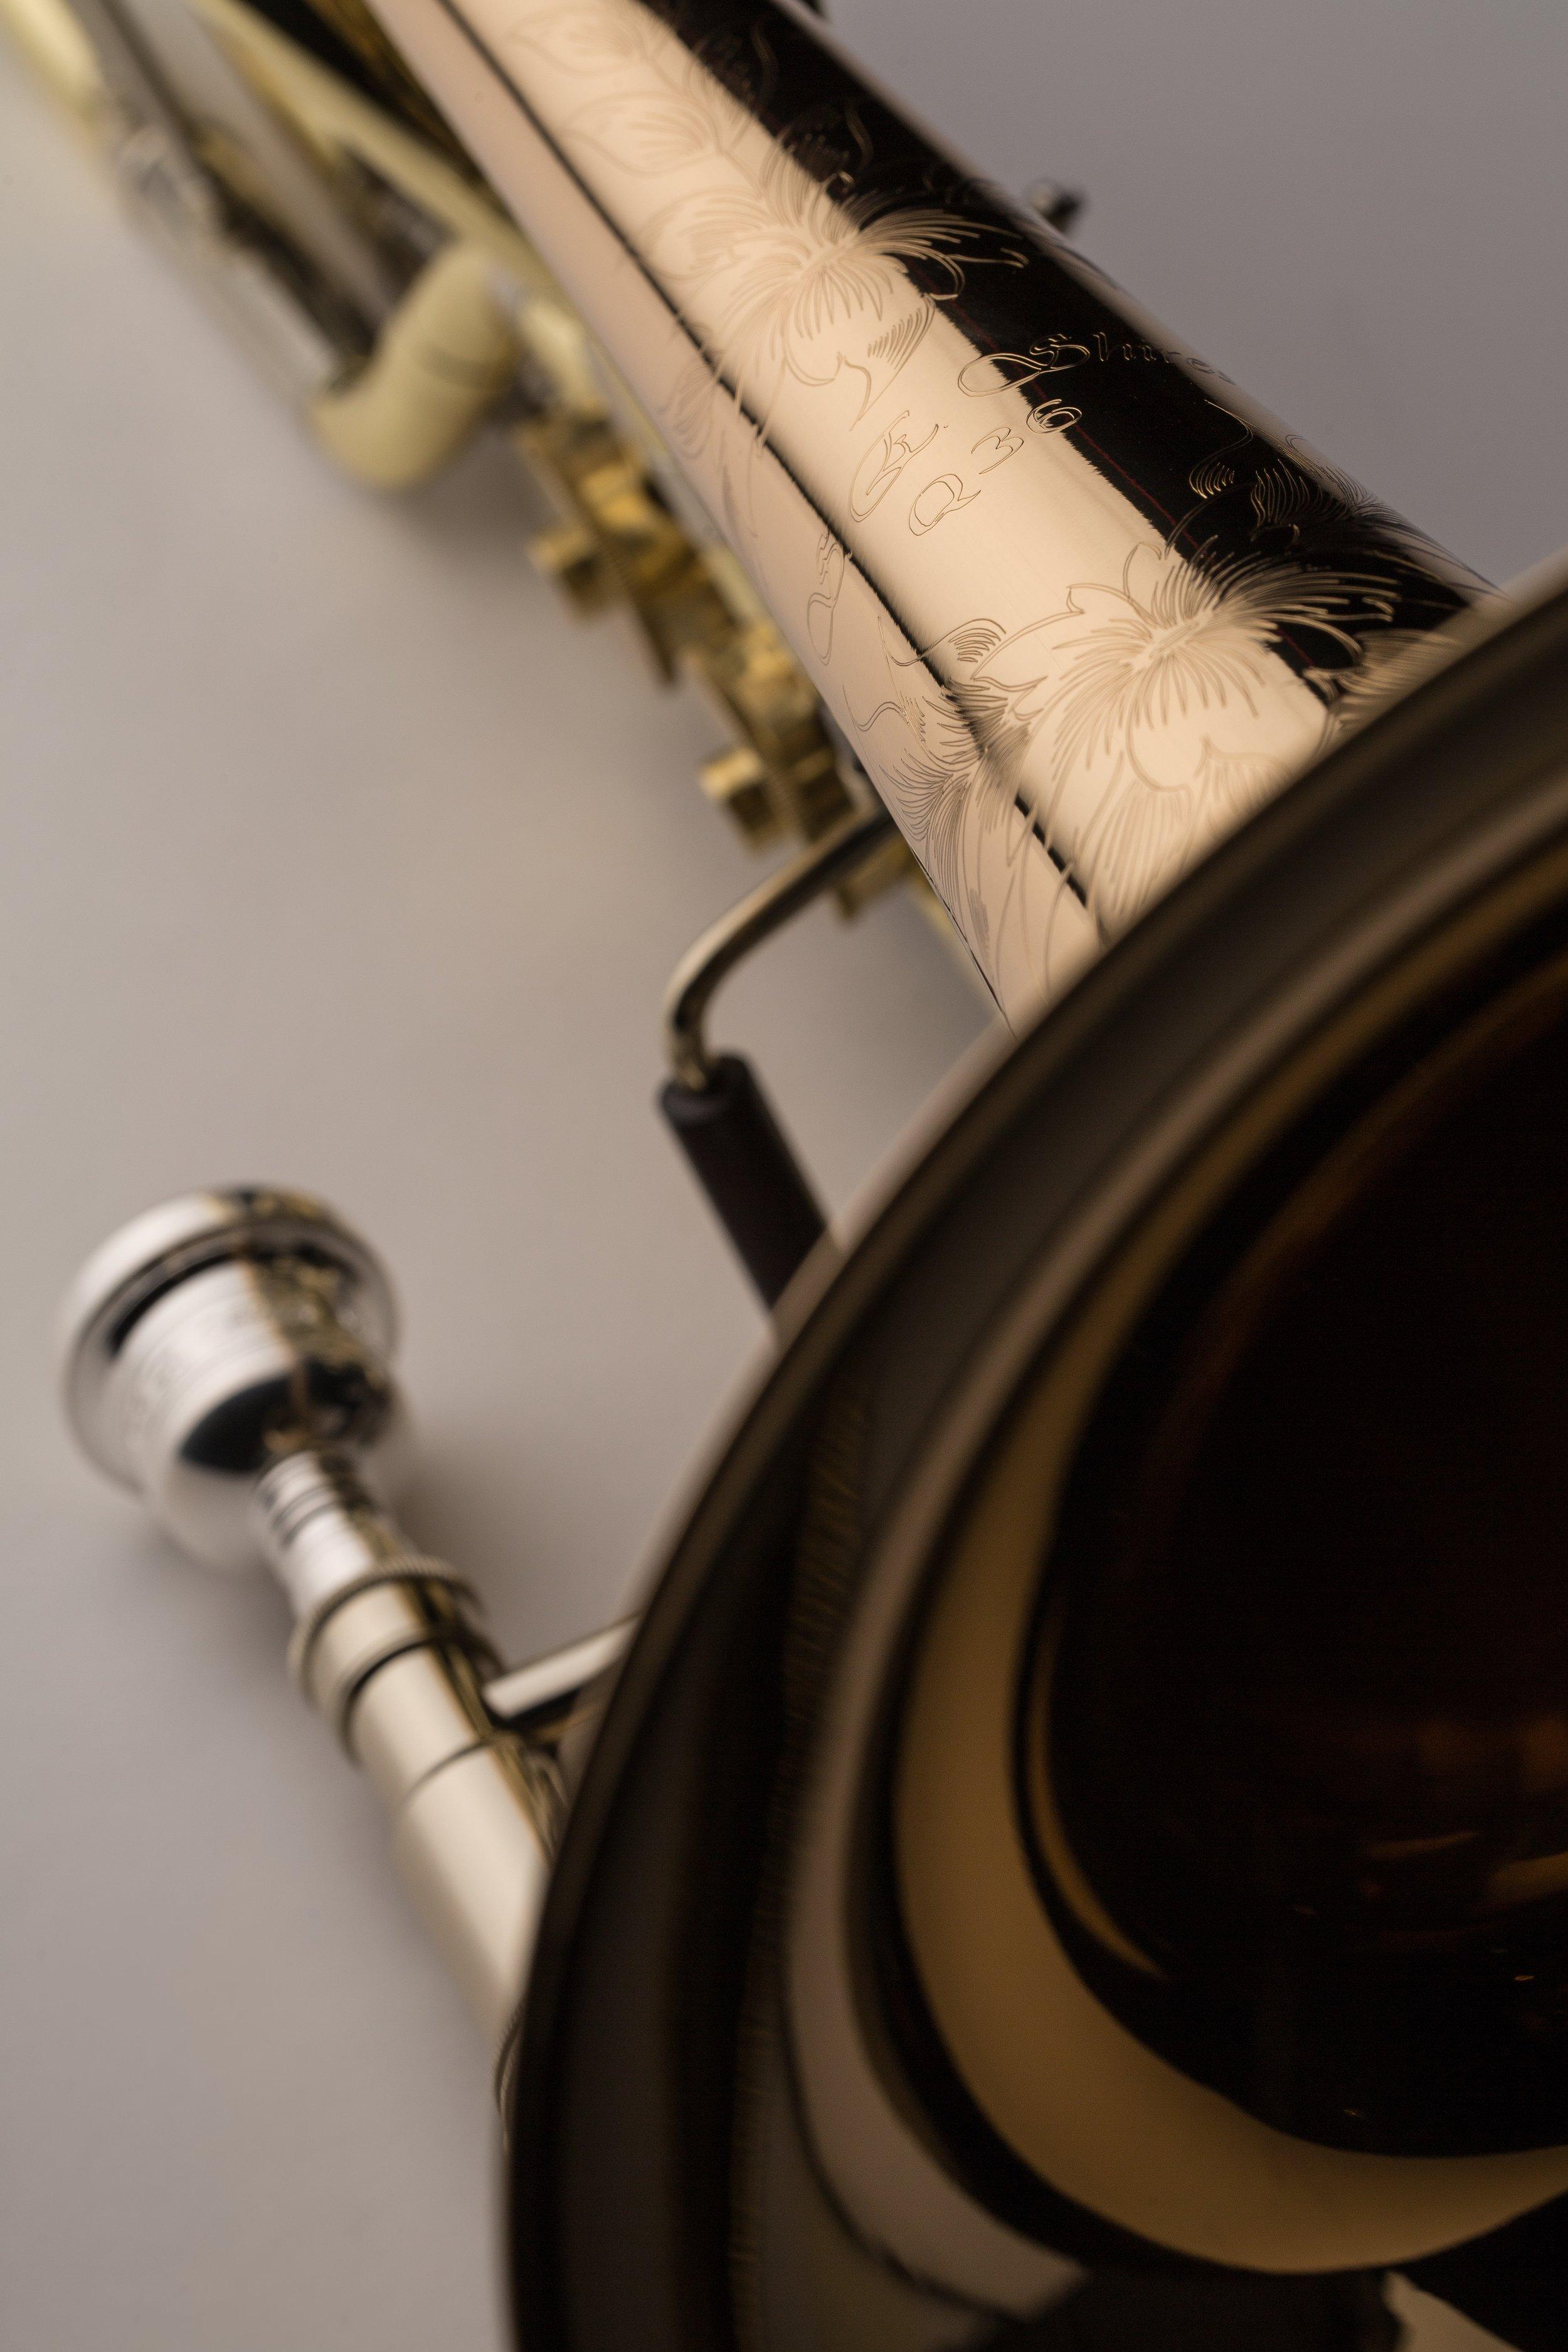 Shires_Trombone_TBQ36GR_CU_Bell_2_0718.jpg